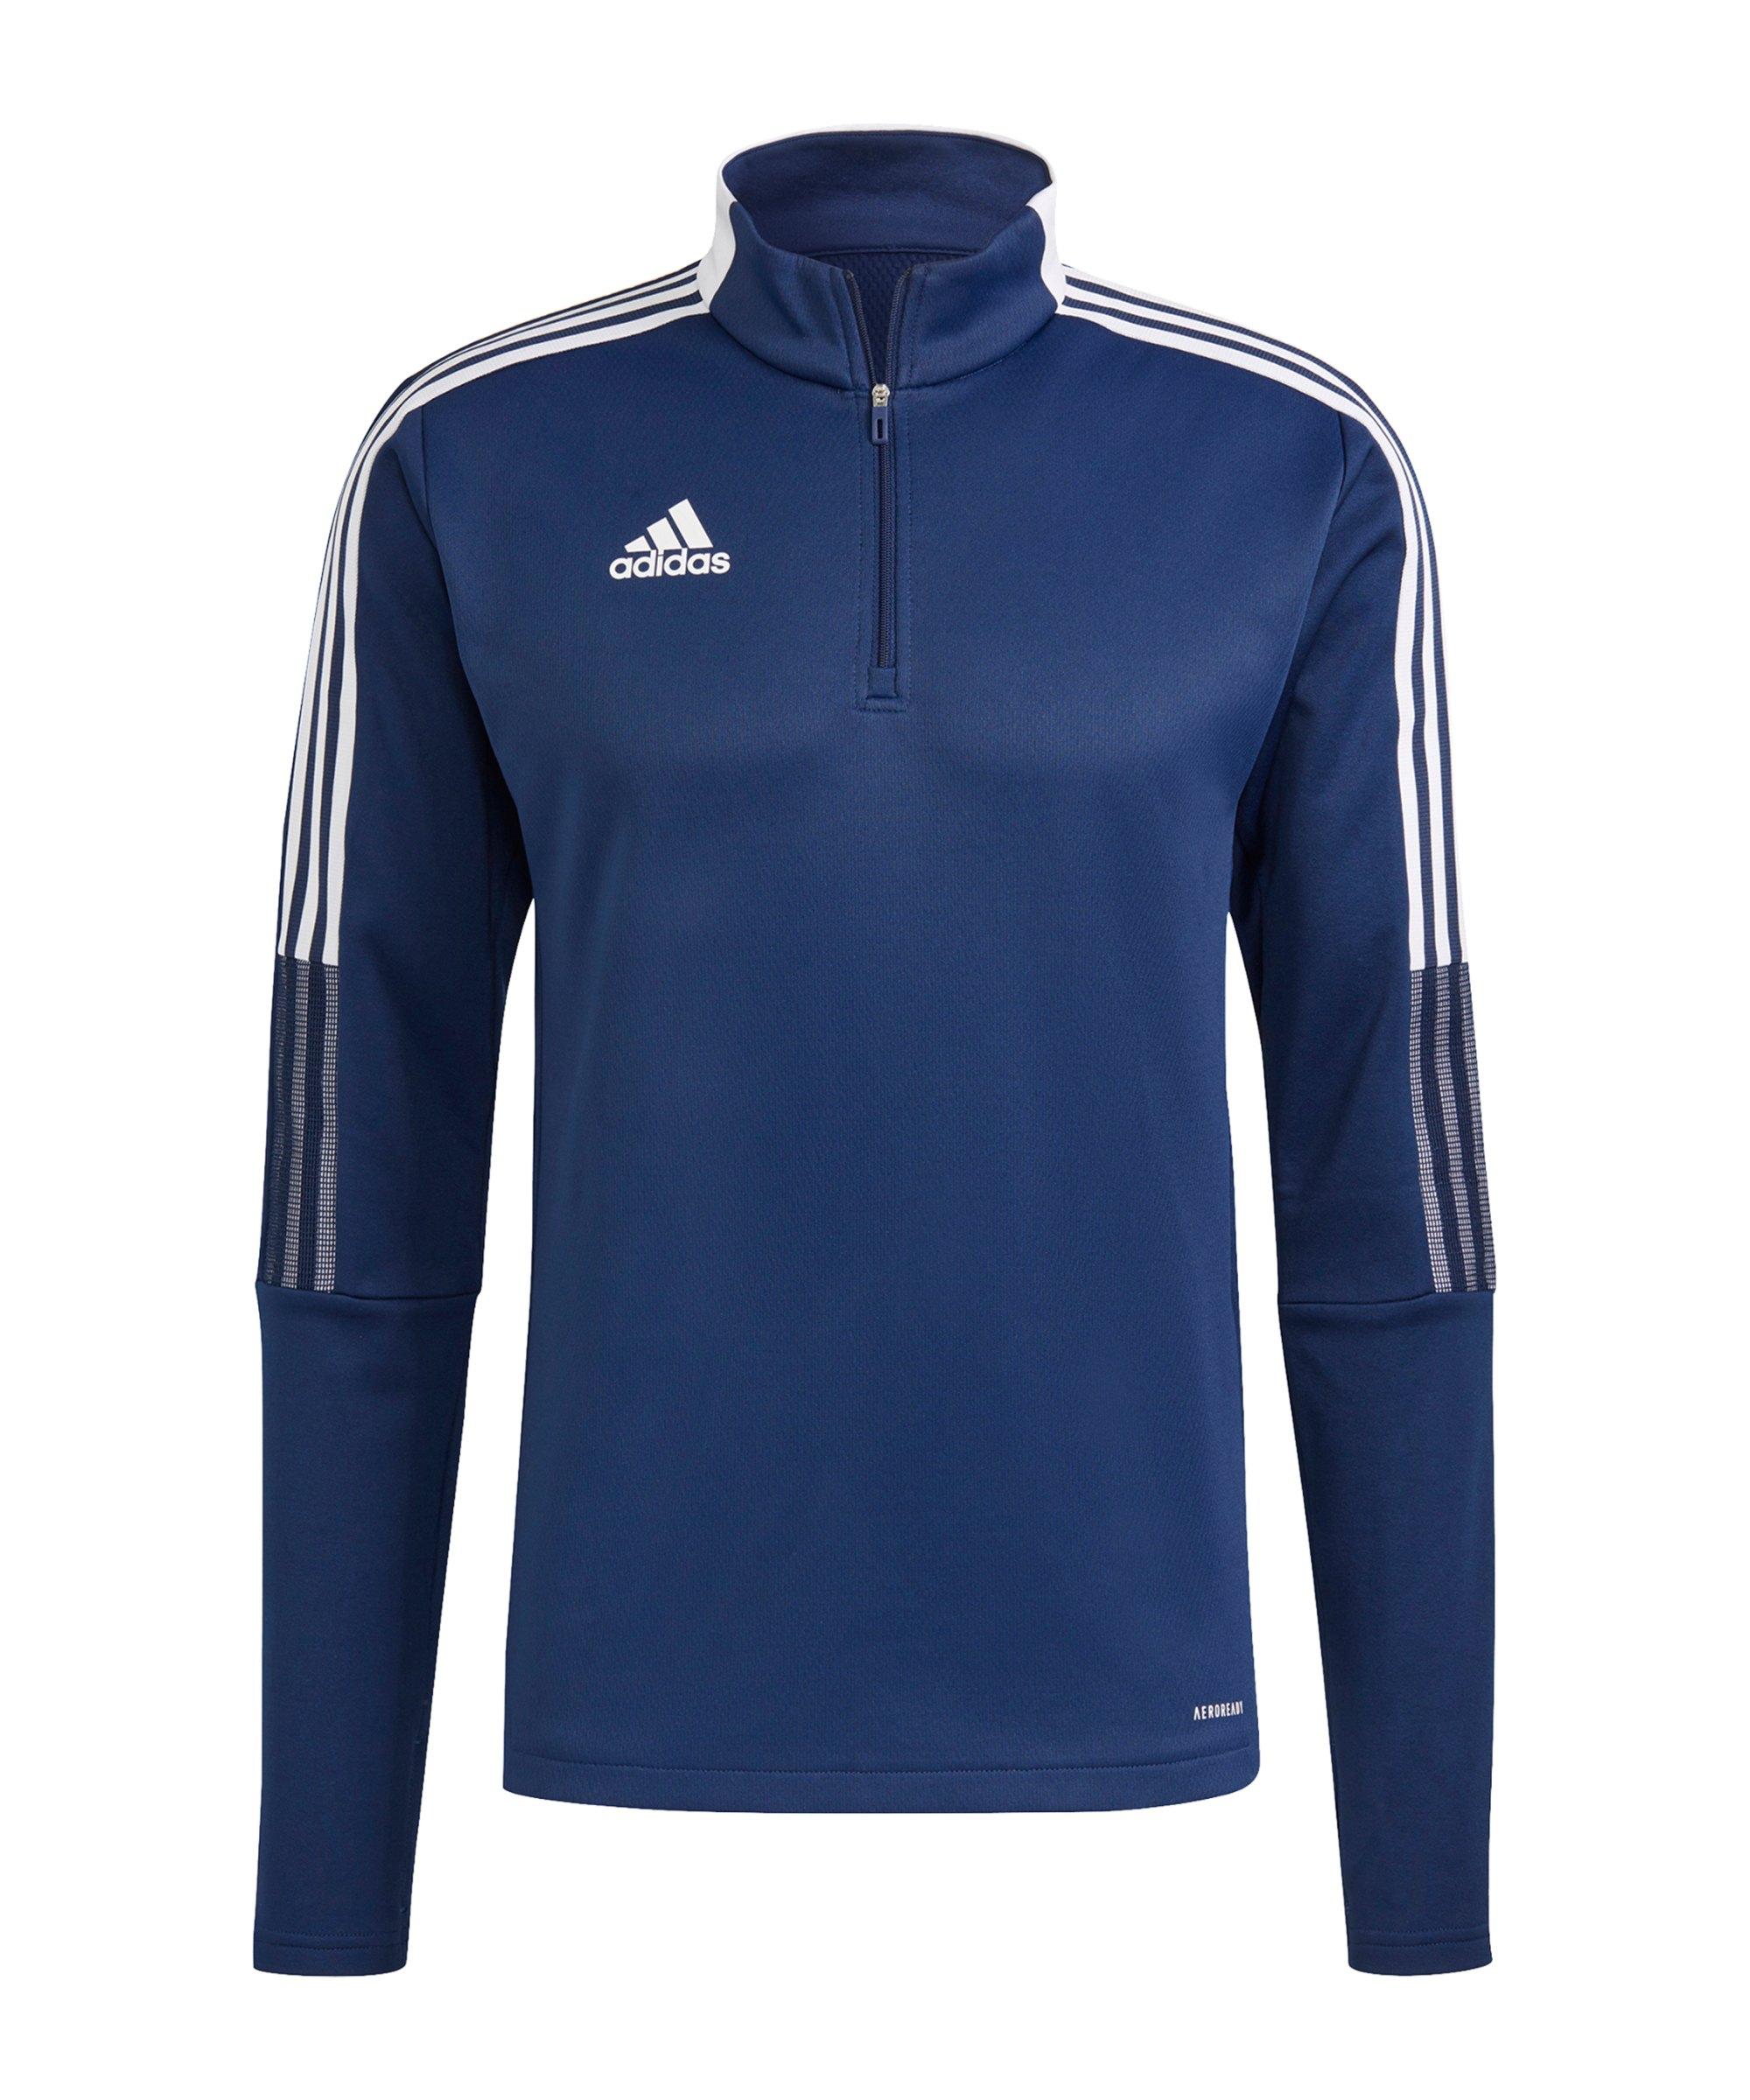 adidas Tiro 21 Warmtop Dunkelblau - blau